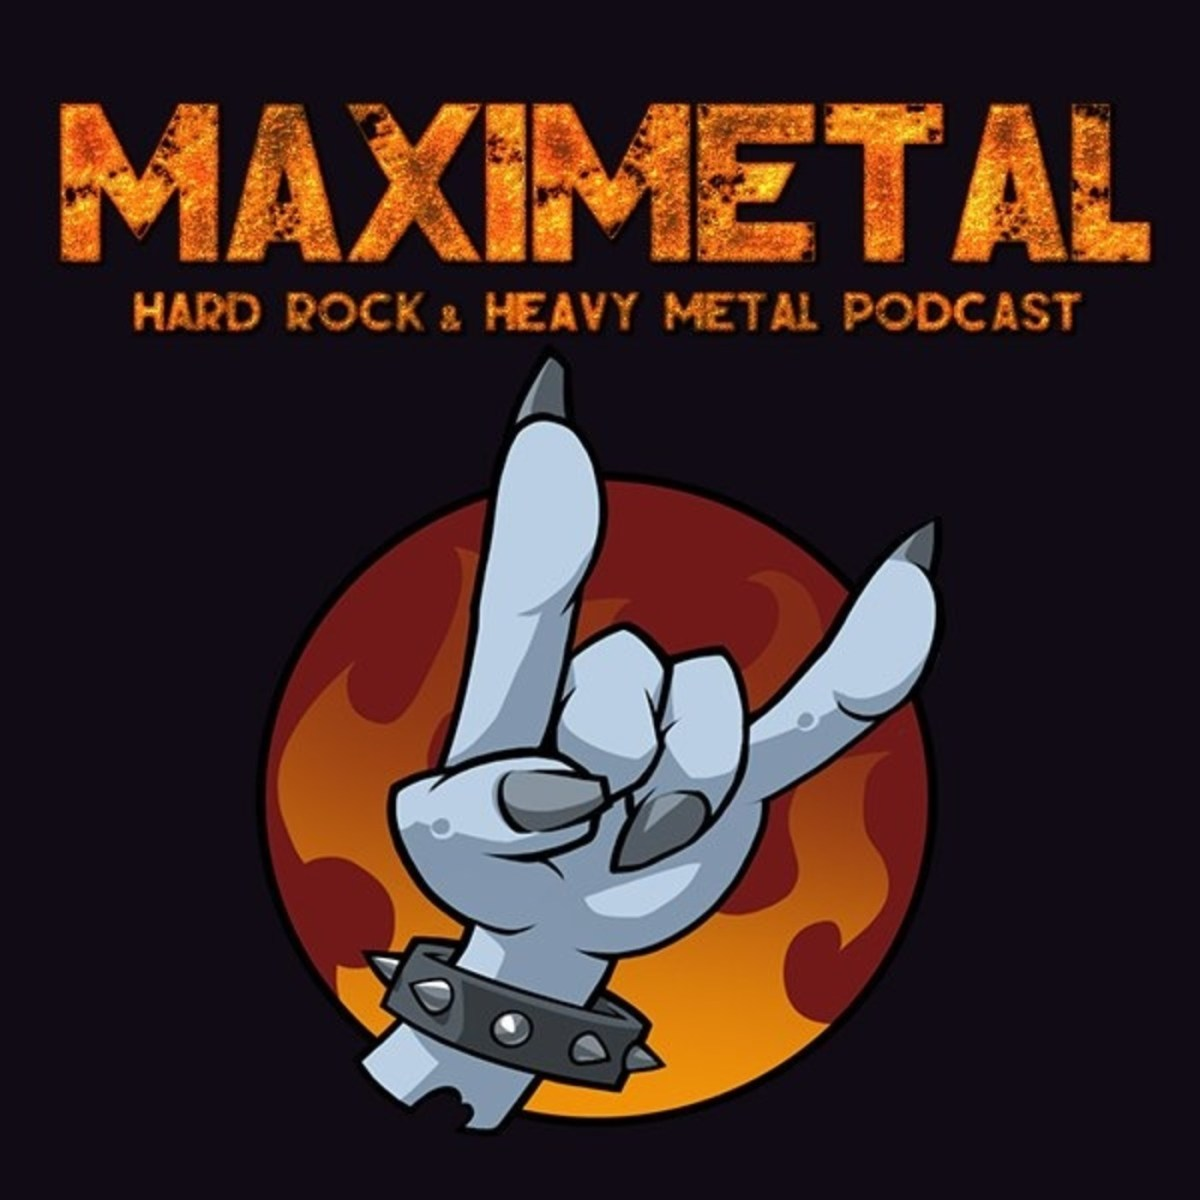 MAXIMETAL EXTRA 41 – 24 septiembre 2021 – Episodio exclusivo para mecenas